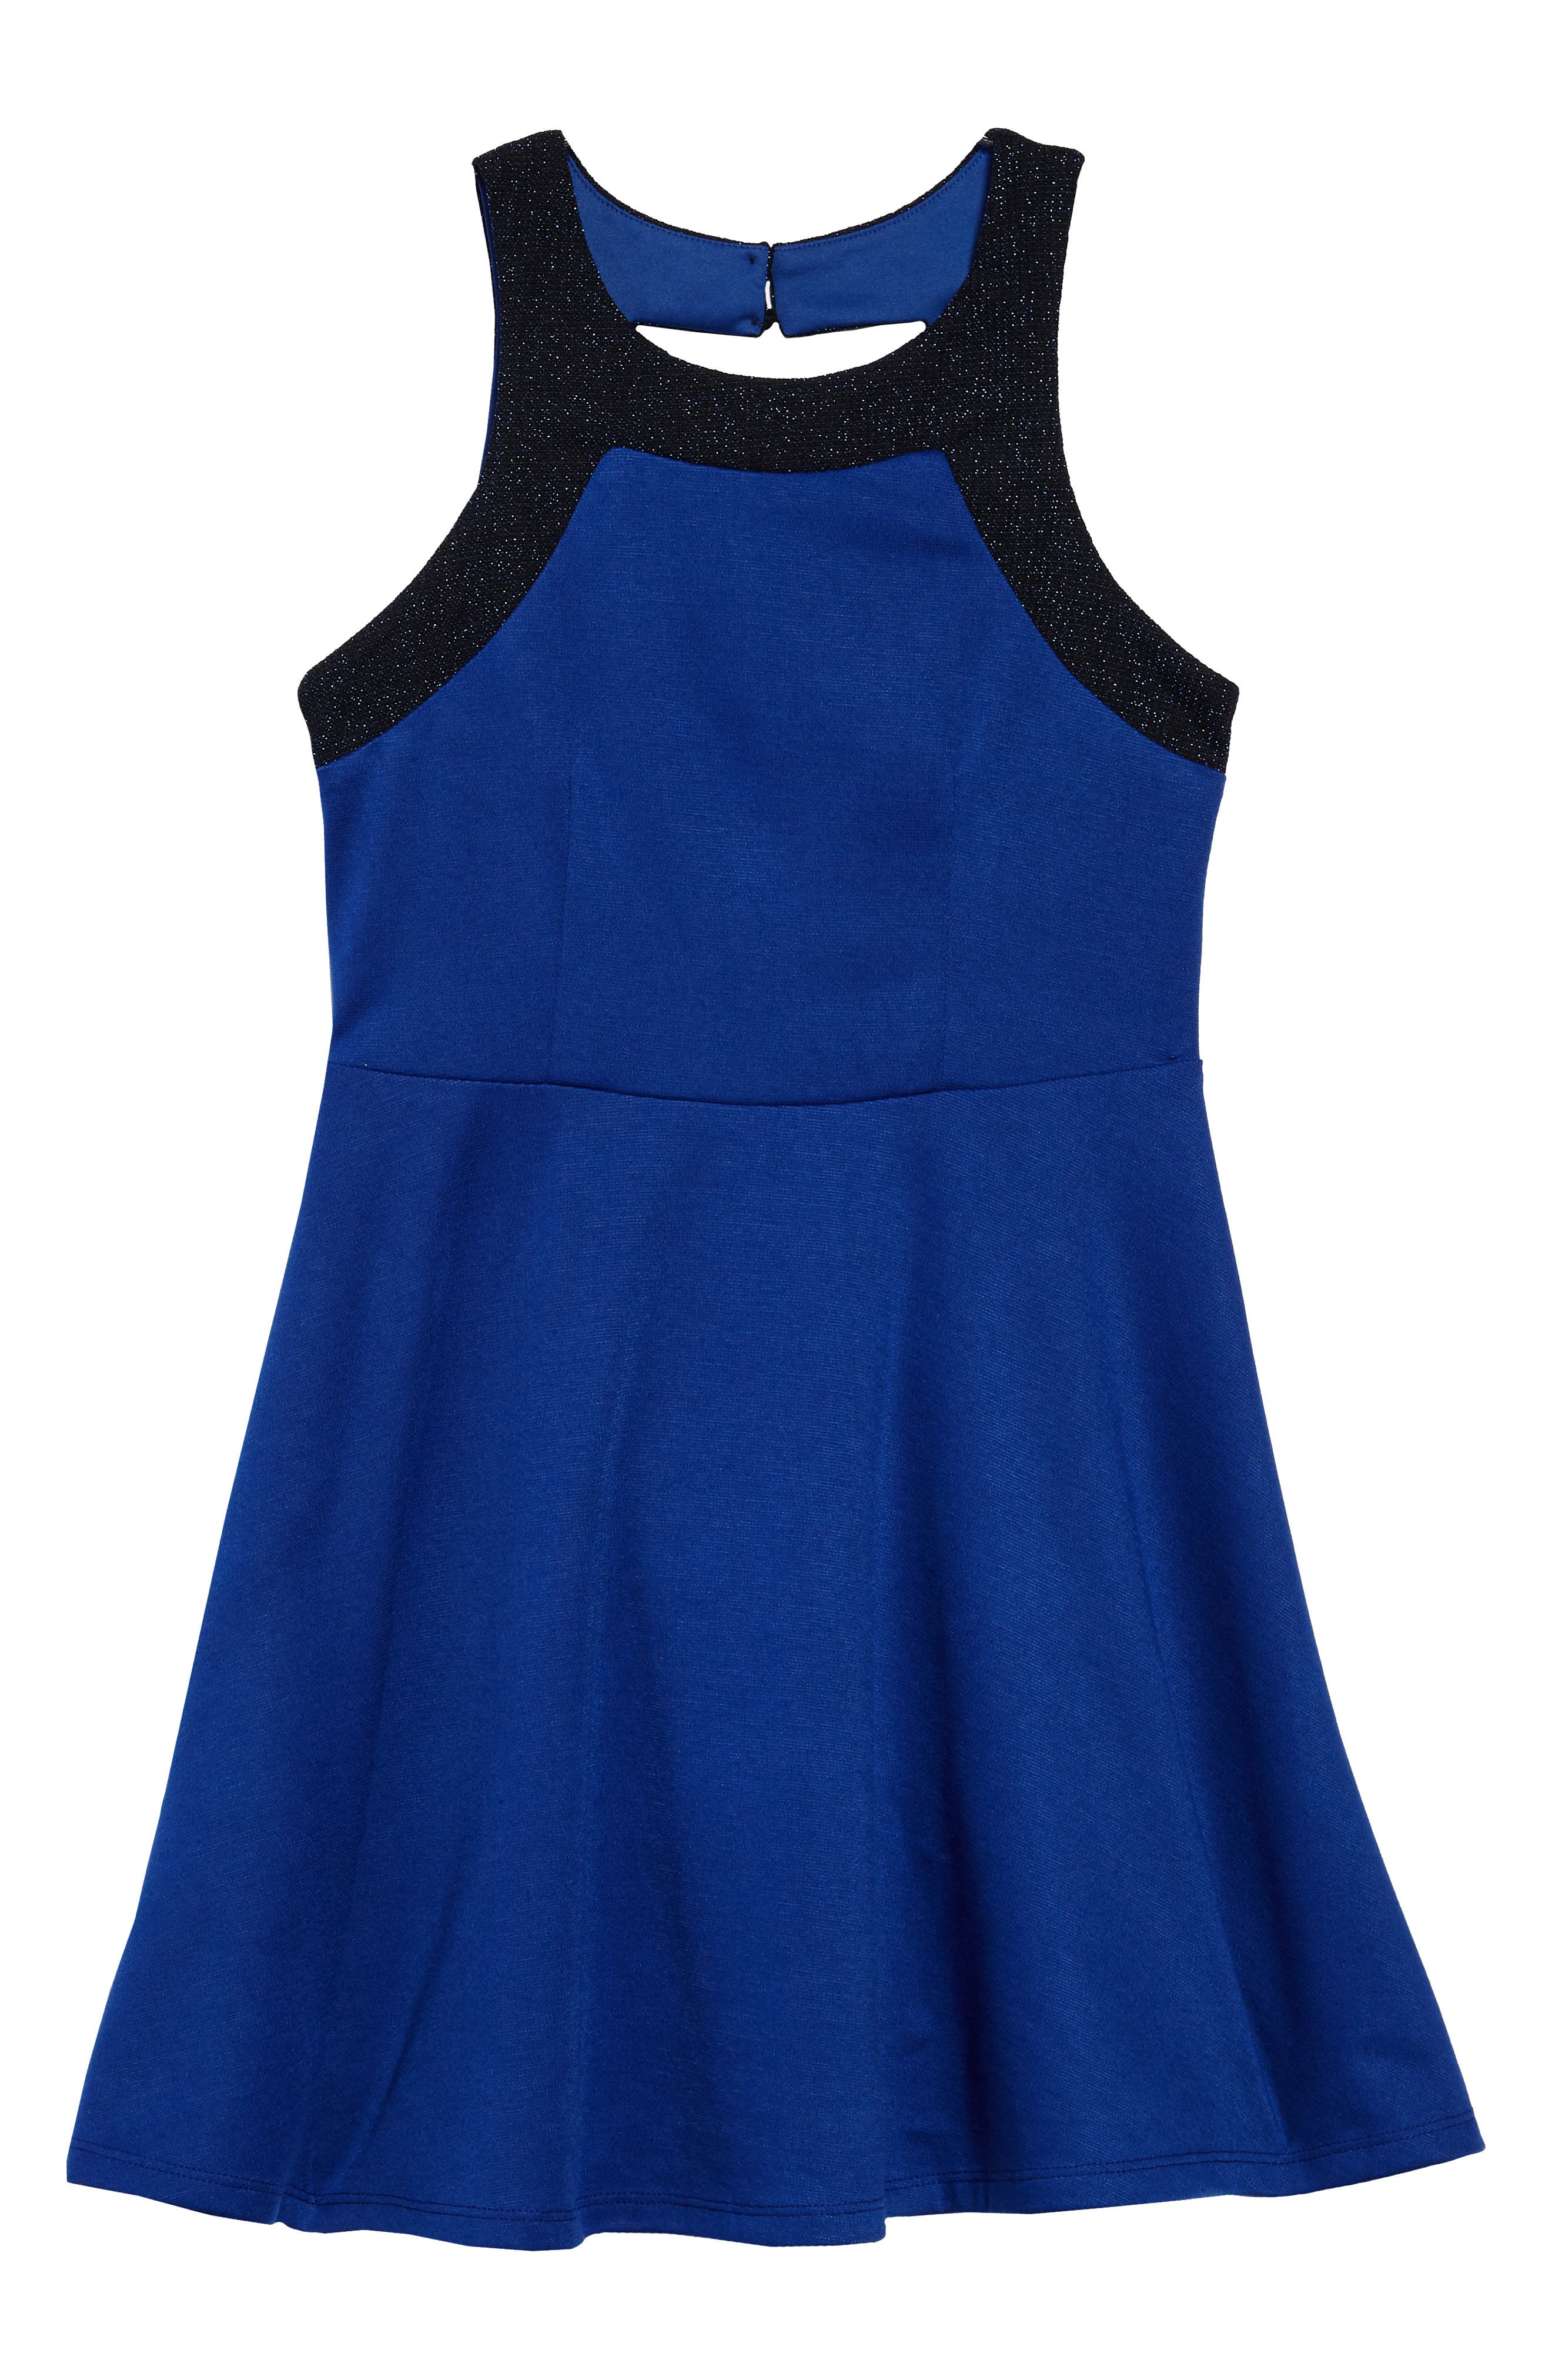 Main Image - Penelope Tree Heather Open Back Dress (Big Girls)